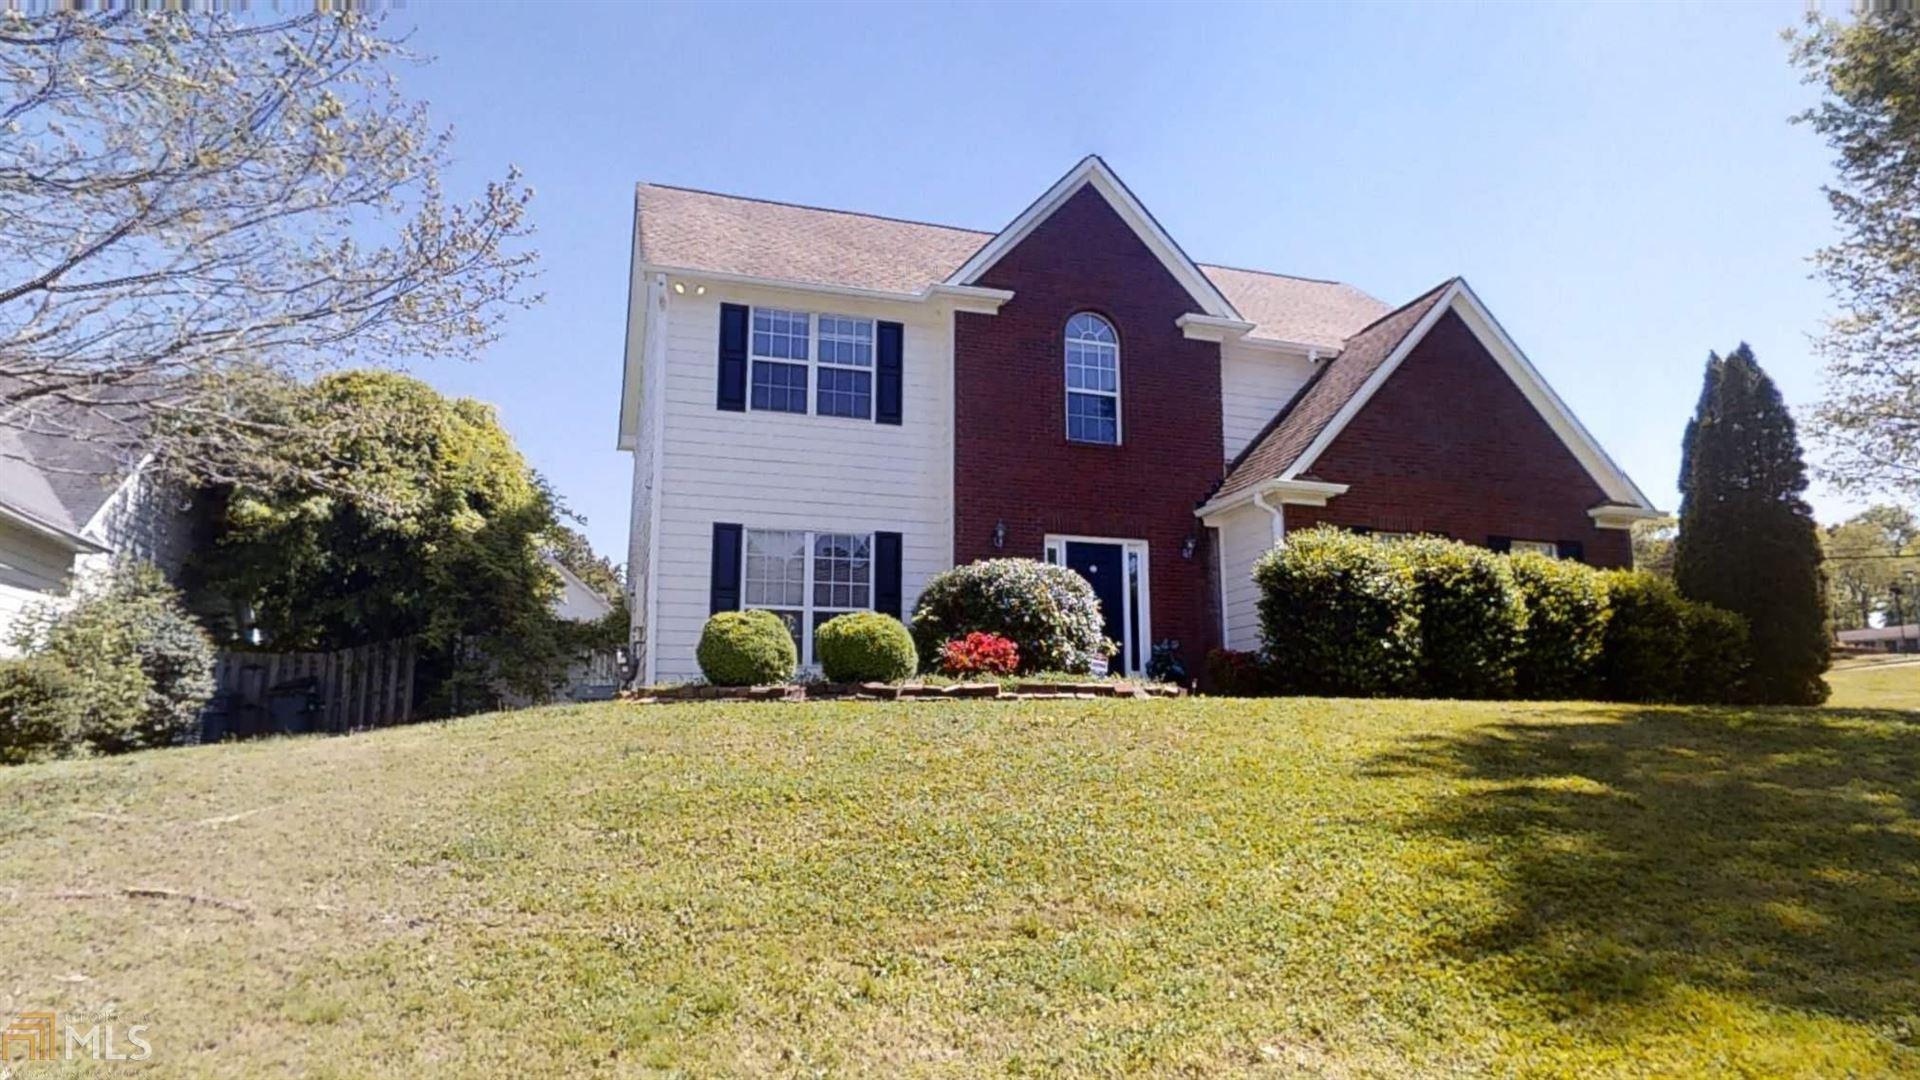 652 Adams Landing Ct, Lawrenceville, GA 30046 - #: 8959179